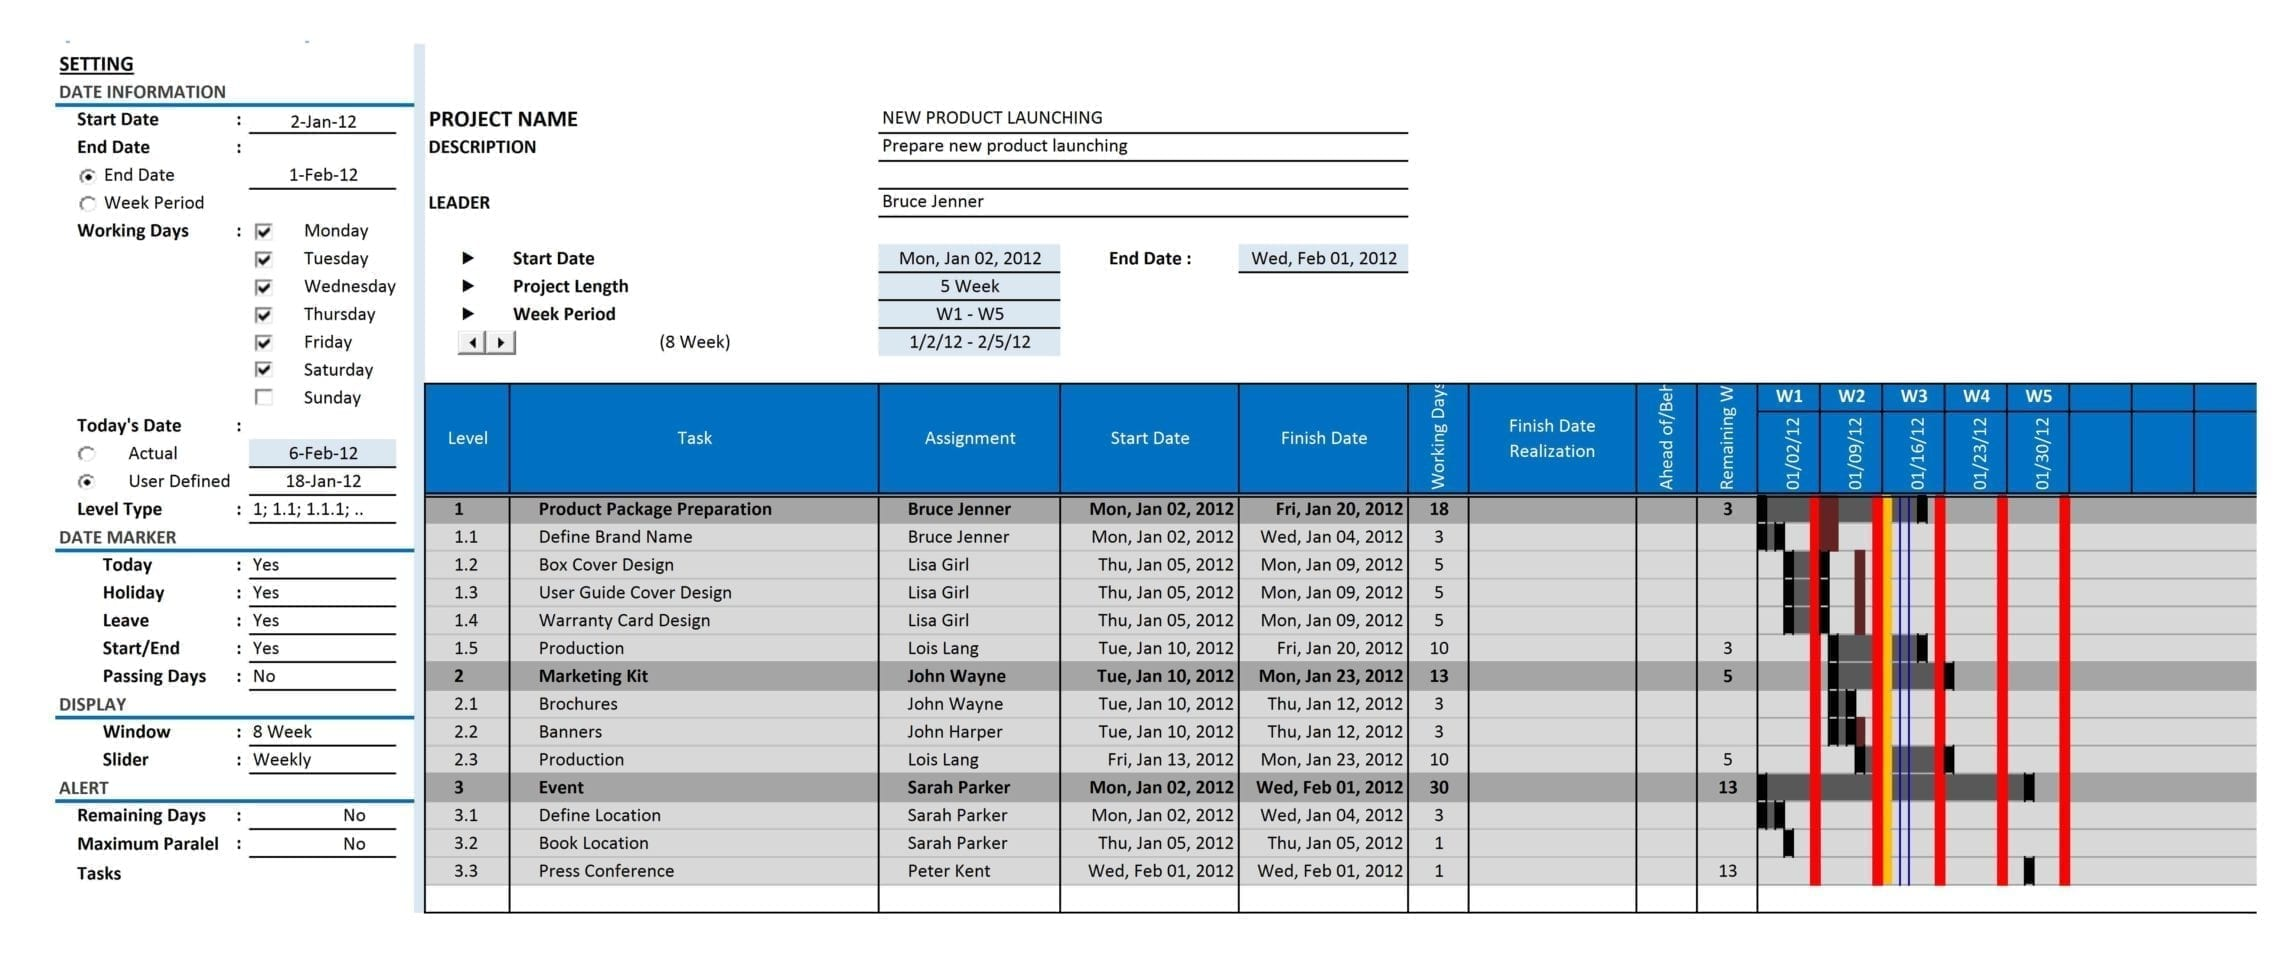 Free Gantt Chart Template Excel 2013 Excel Gantt Chart Template Xls Gantt Chart Excel 2010 Download Gantt Chart Excel Template 2013 Excel 2010 Gantt Chart Template Project Management Gantt Chart Excel Excel Simple Gantt Chart Template  Excel Simple Gantt Chart Template Excel Spreadsheet Gantt Chart Template Spreadsheet Templates for Busines